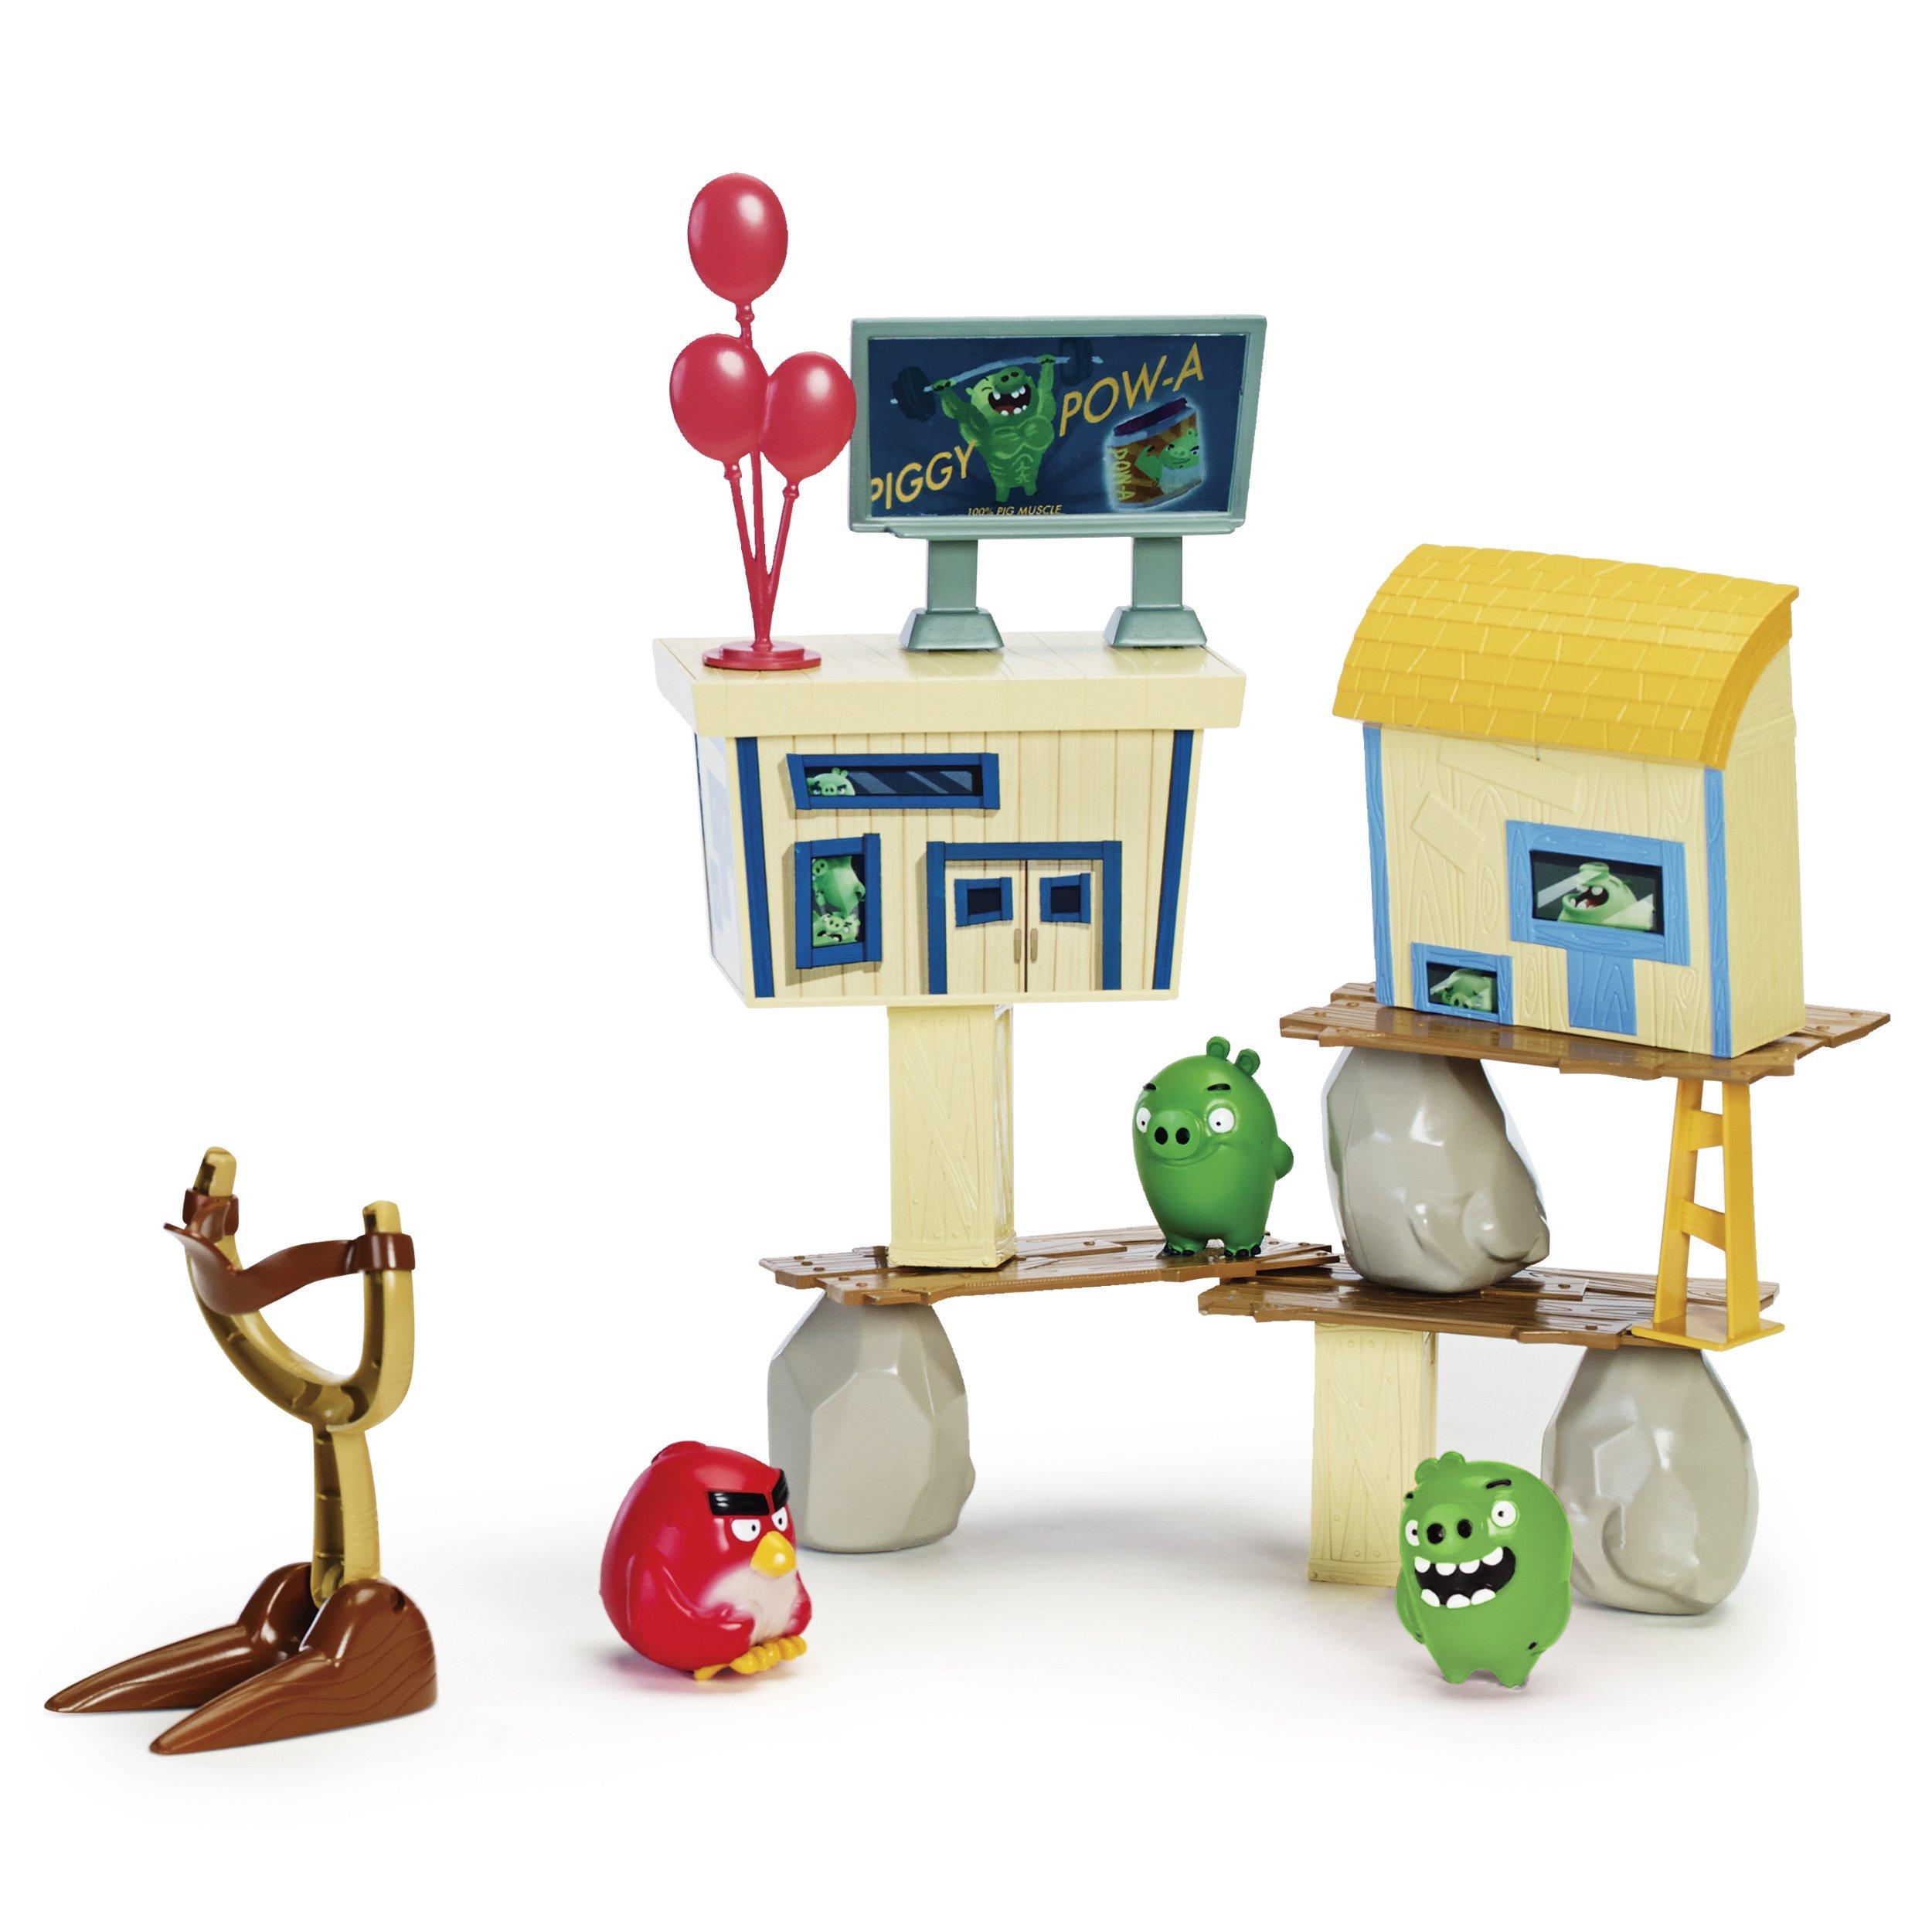 Angry Birds Pig City Strike Playset